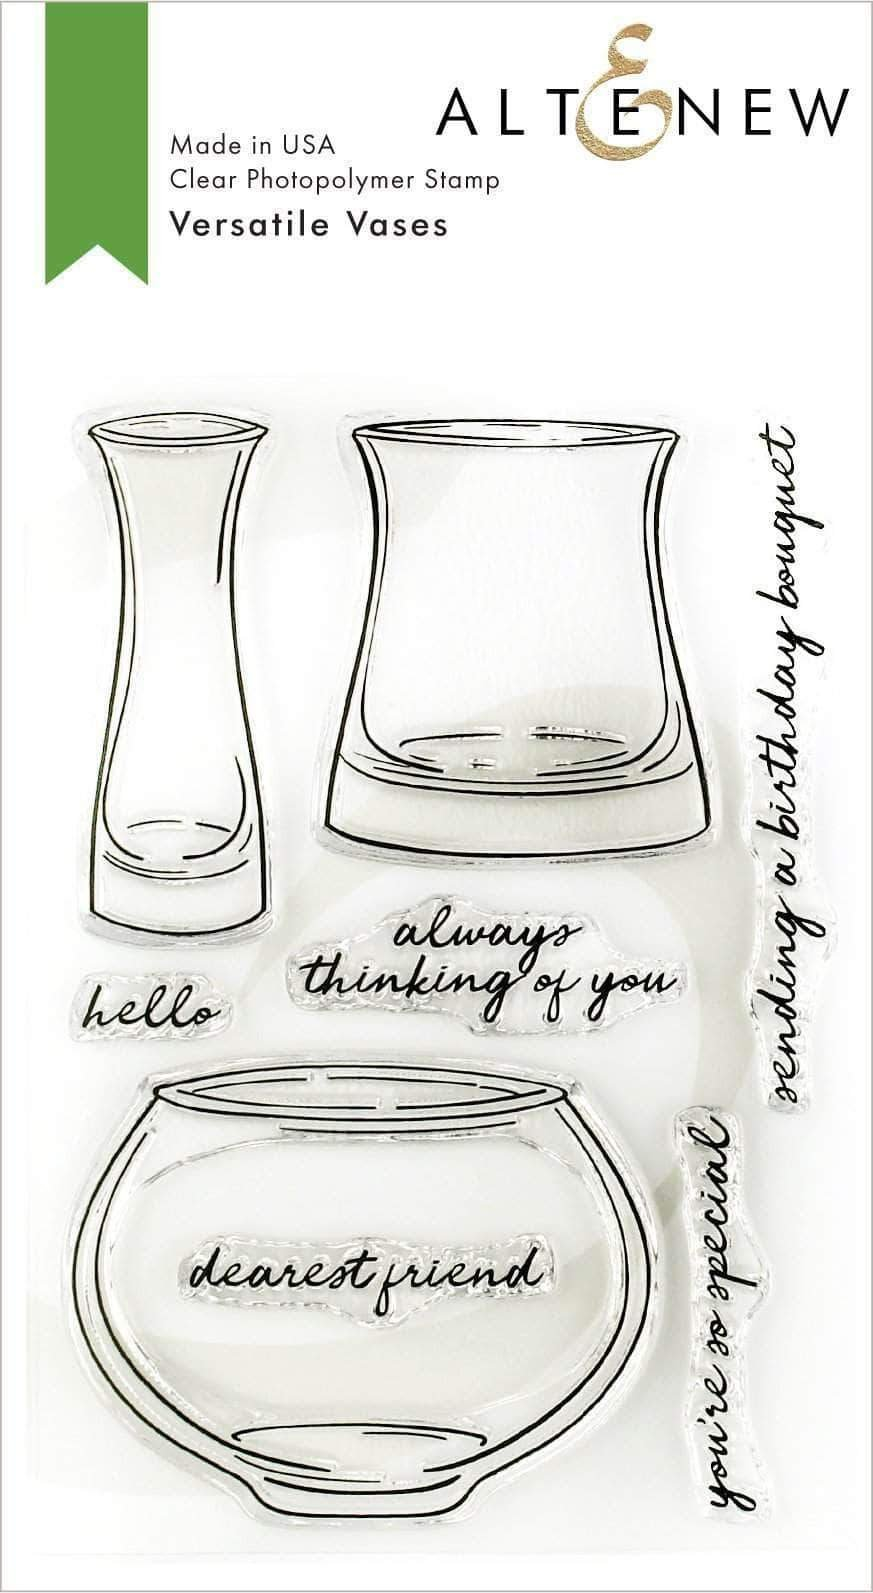 Altenew Versatile Vases 2 Stamp Set